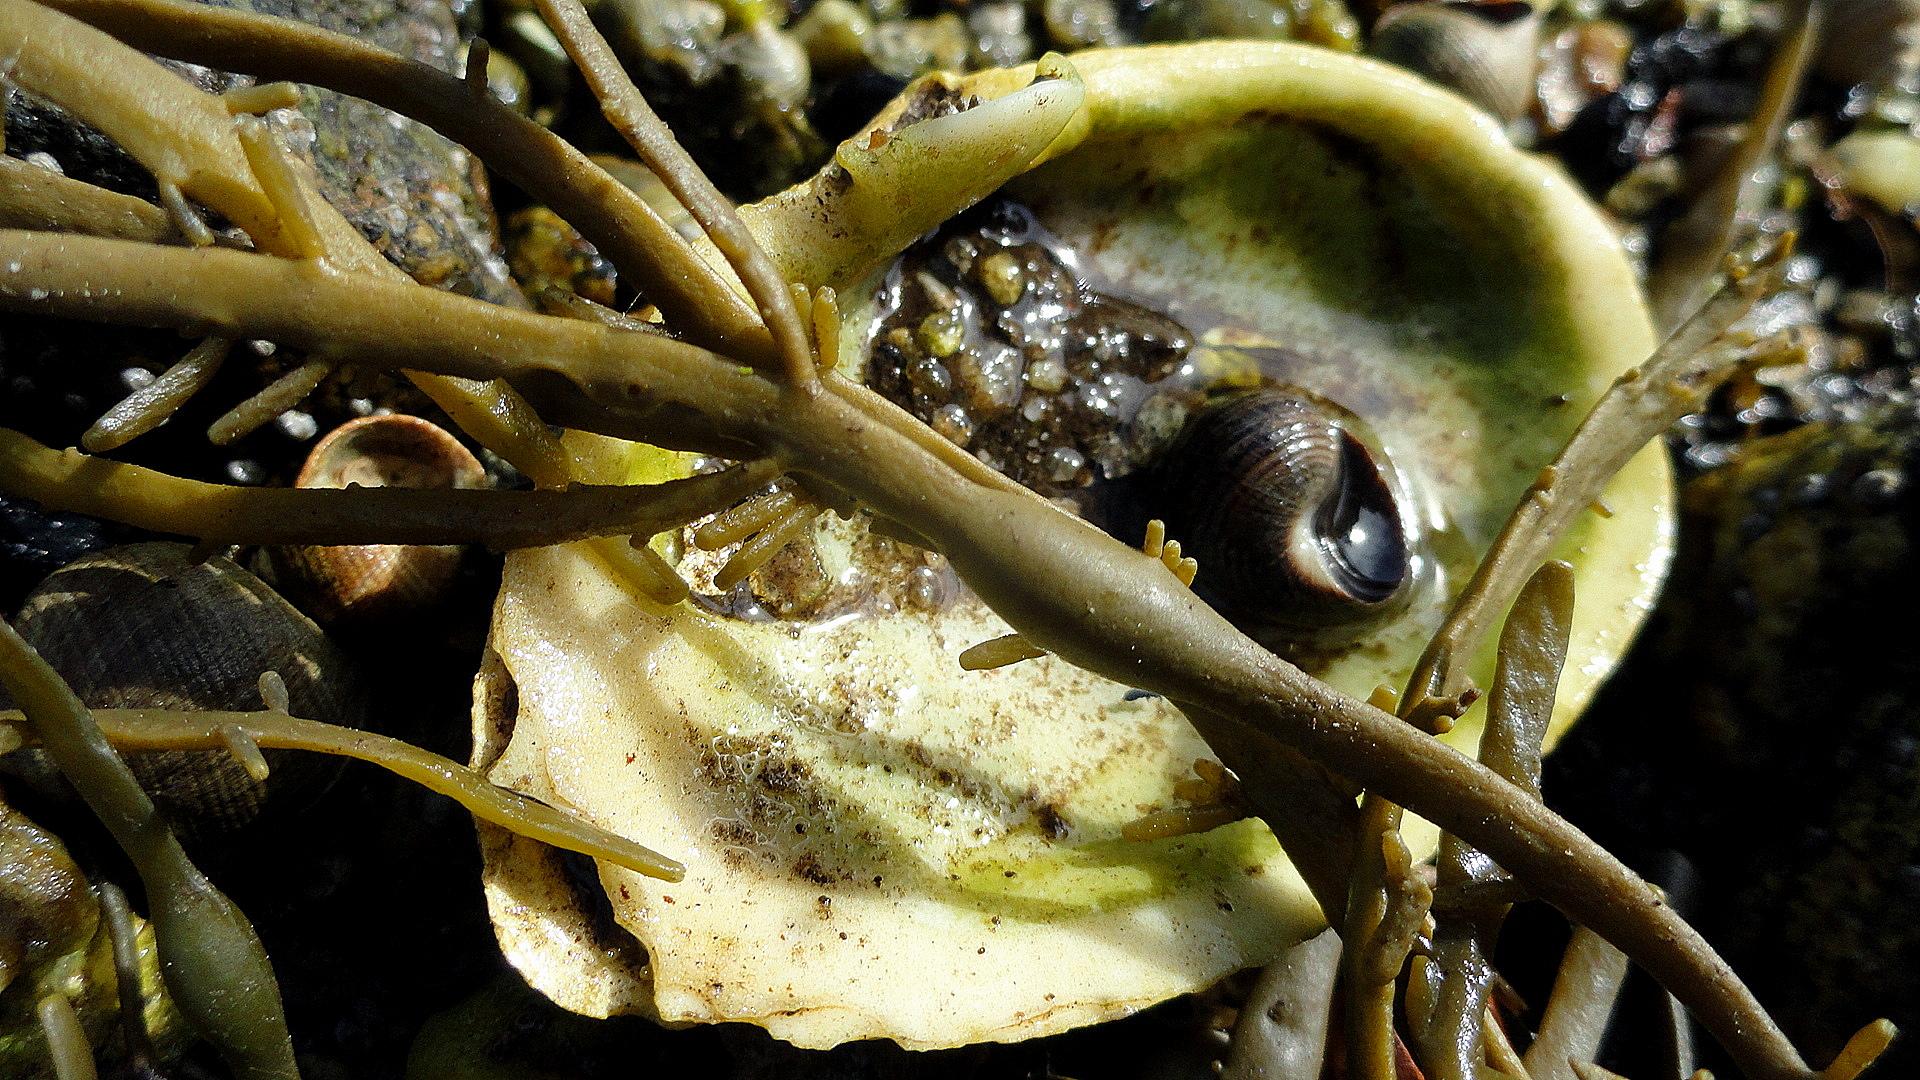 Shelll & Seaweed at Lowtide